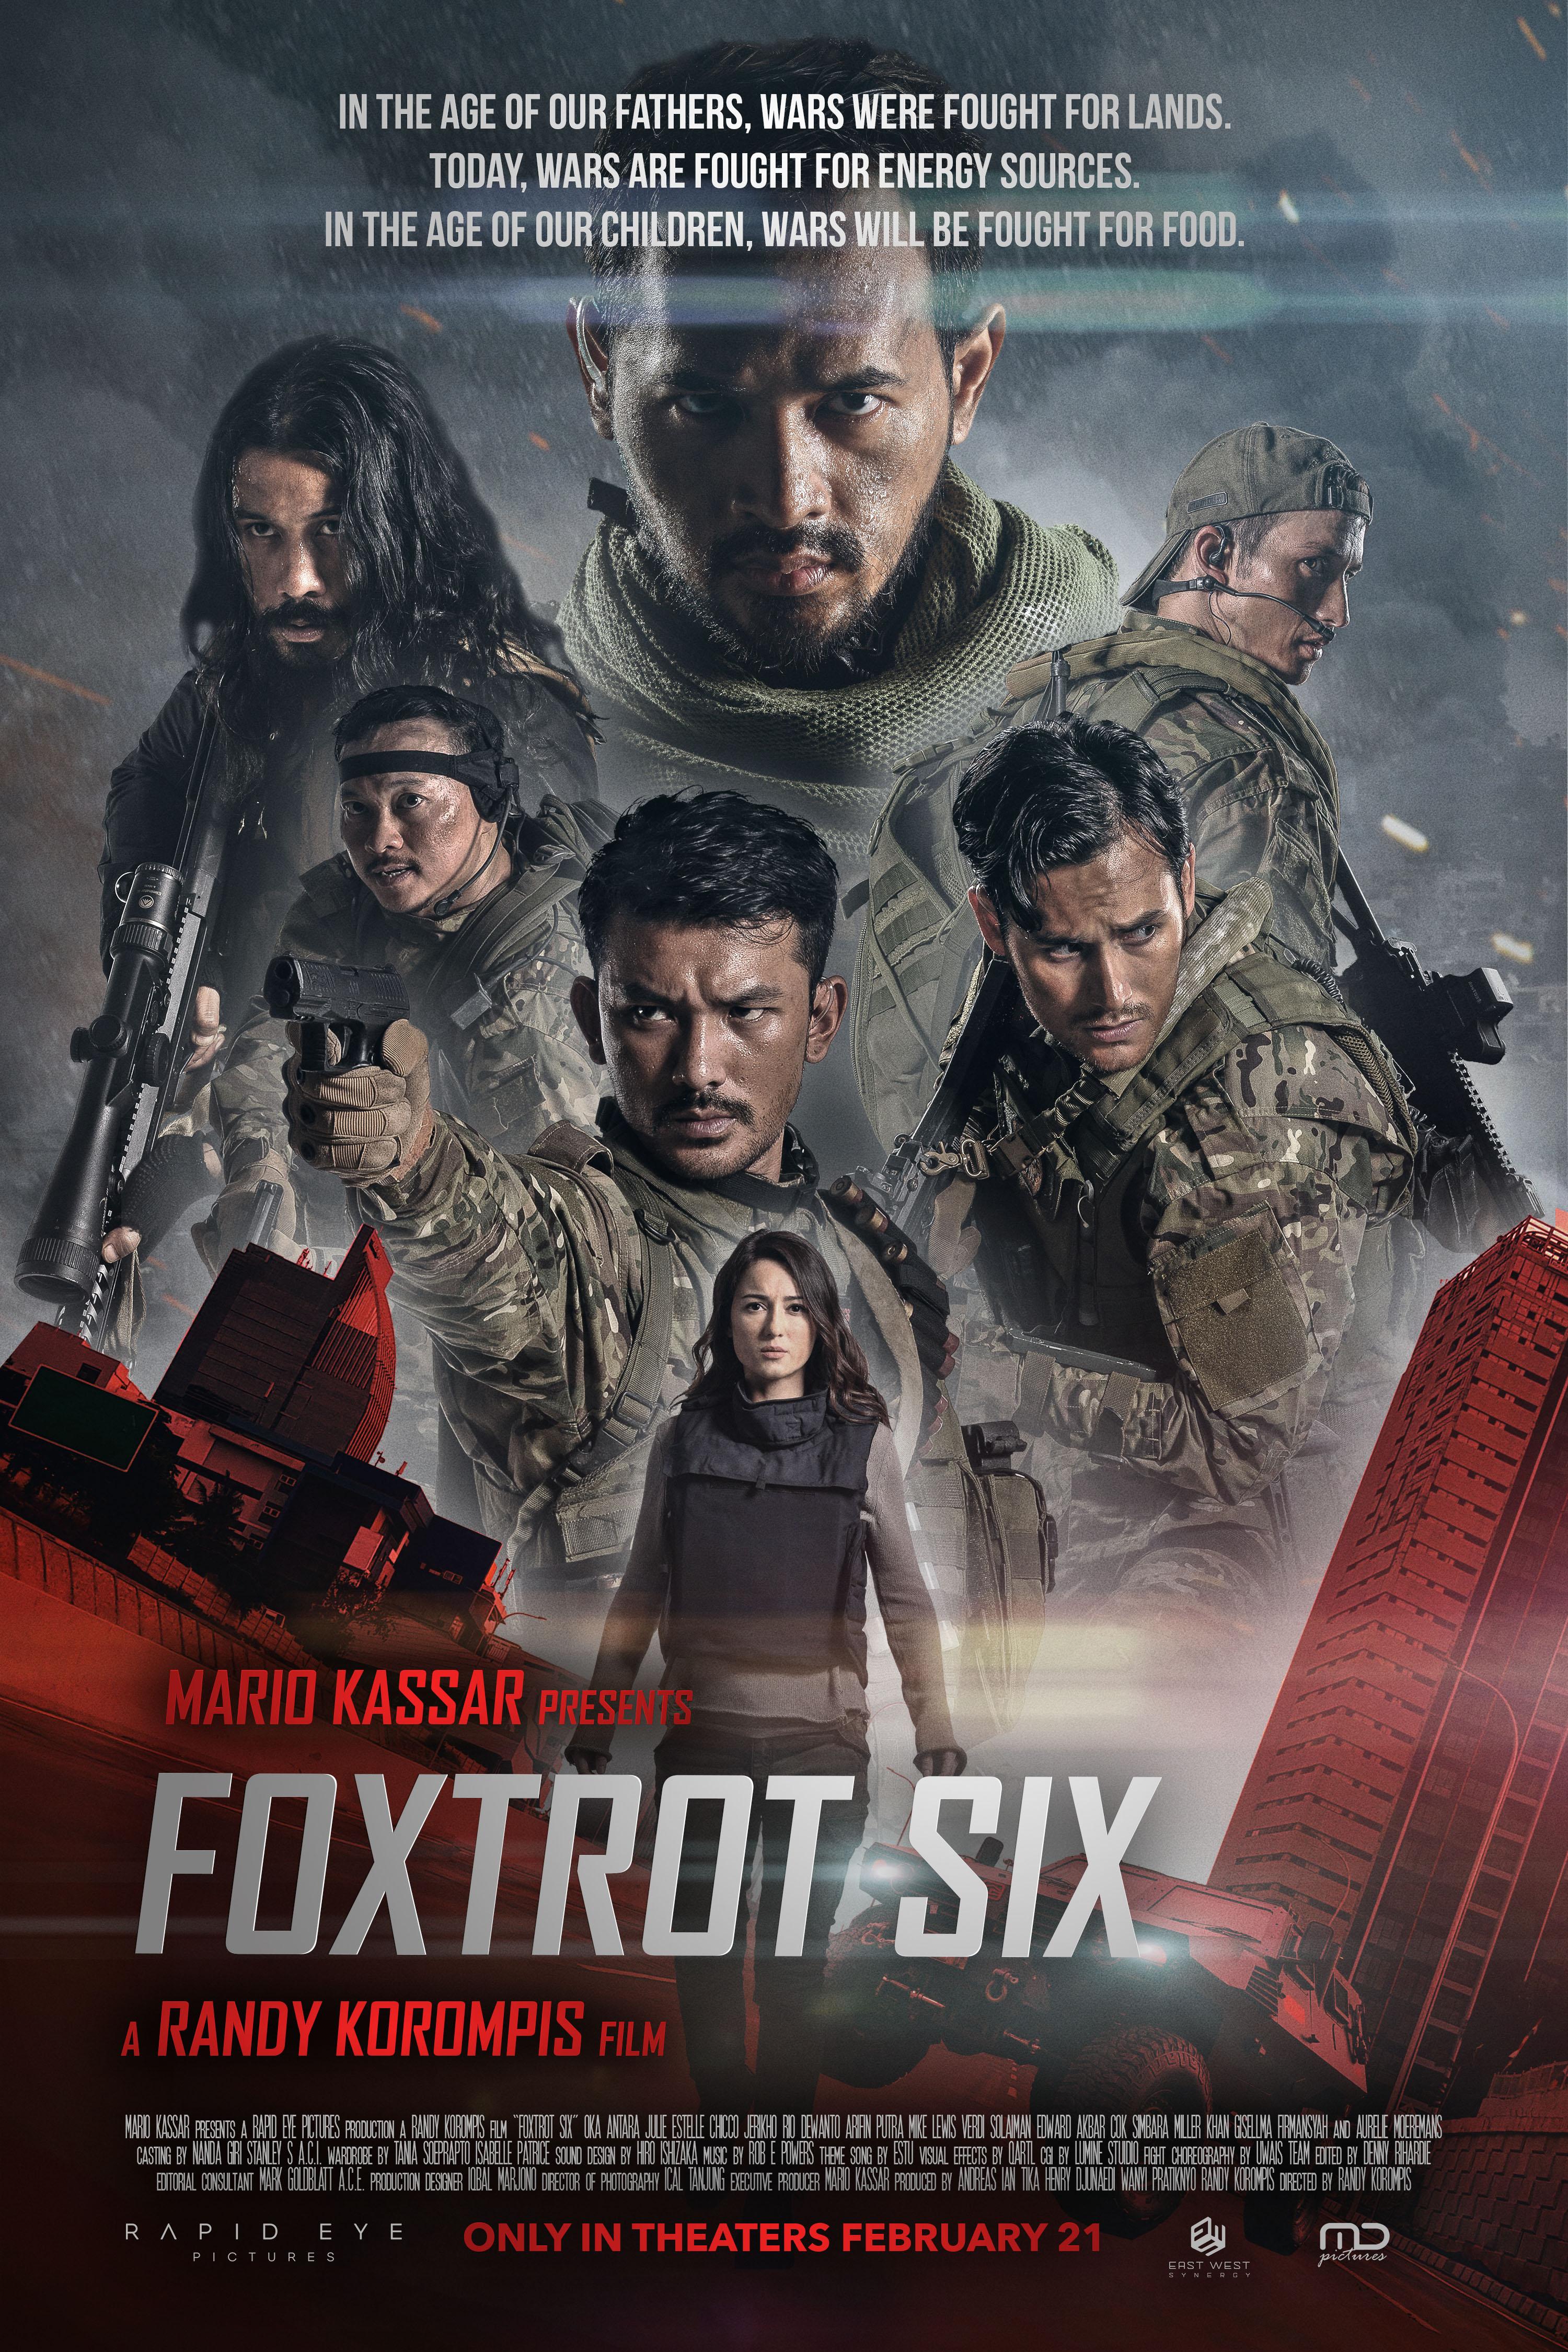 فيلم Foxtrot Six 2019 مترجم